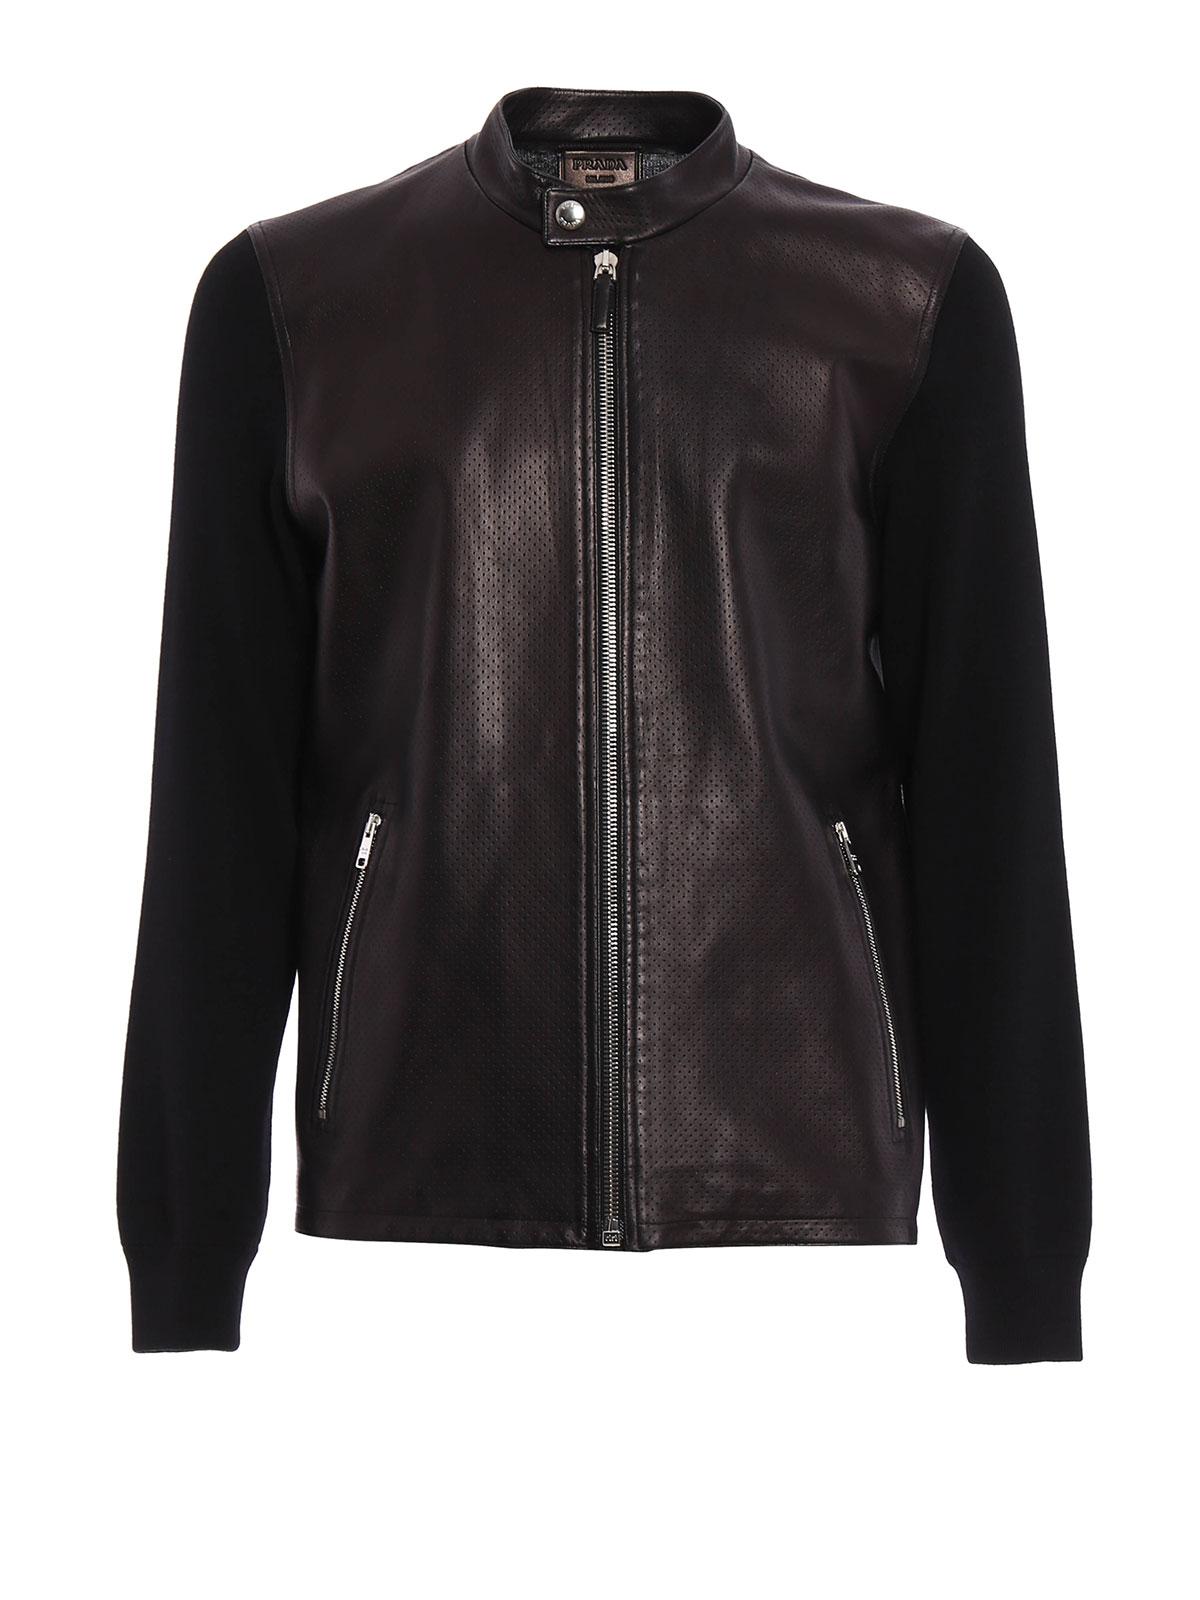 Wool leather jacket